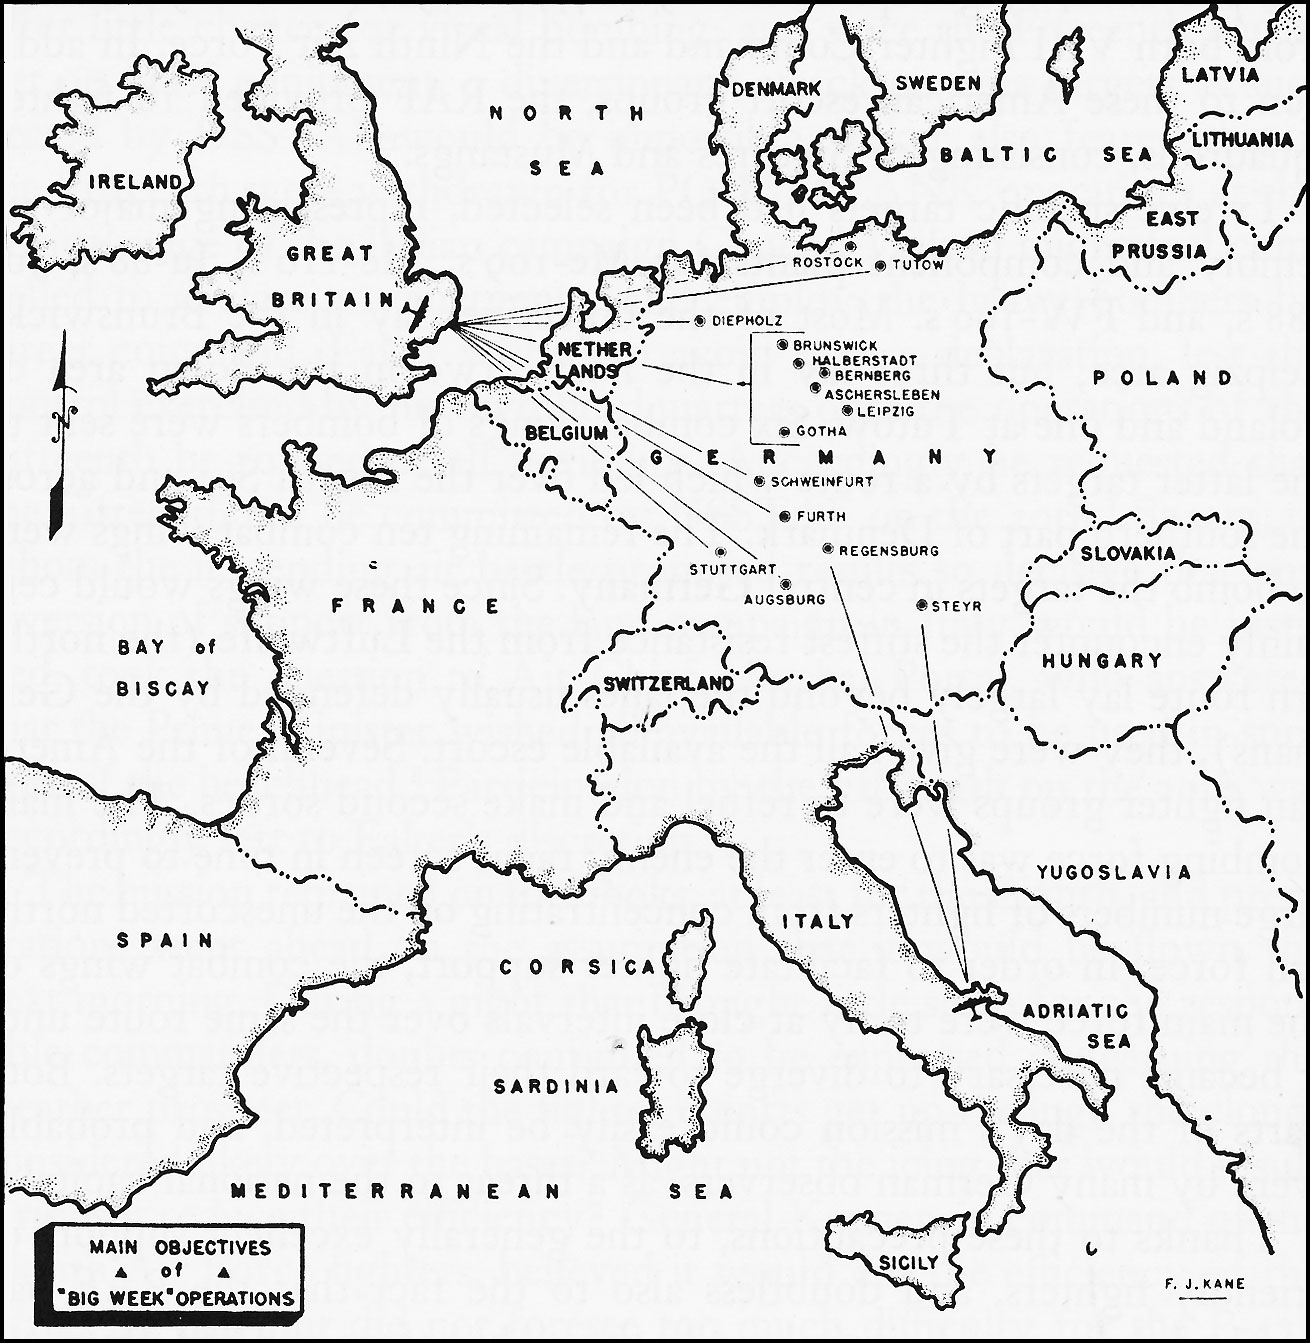 blank map of europe in world war 2